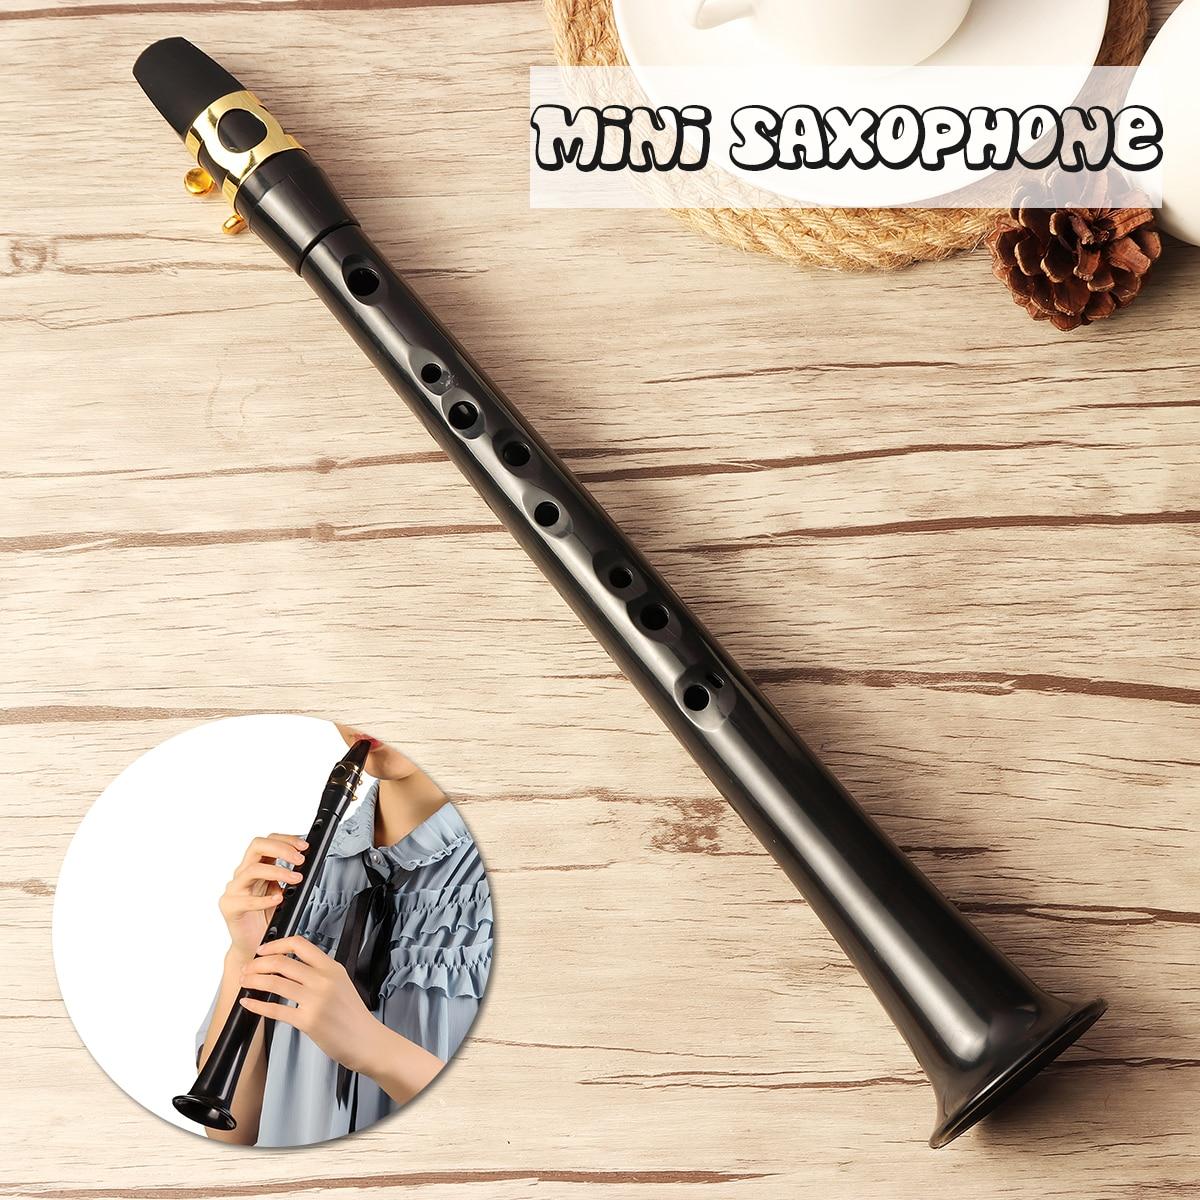 Negro LittleSax Mini Sax portátil C clave saxofón ABS ligero Sax instrumentos musicales con bolsa de transporte para el principiante